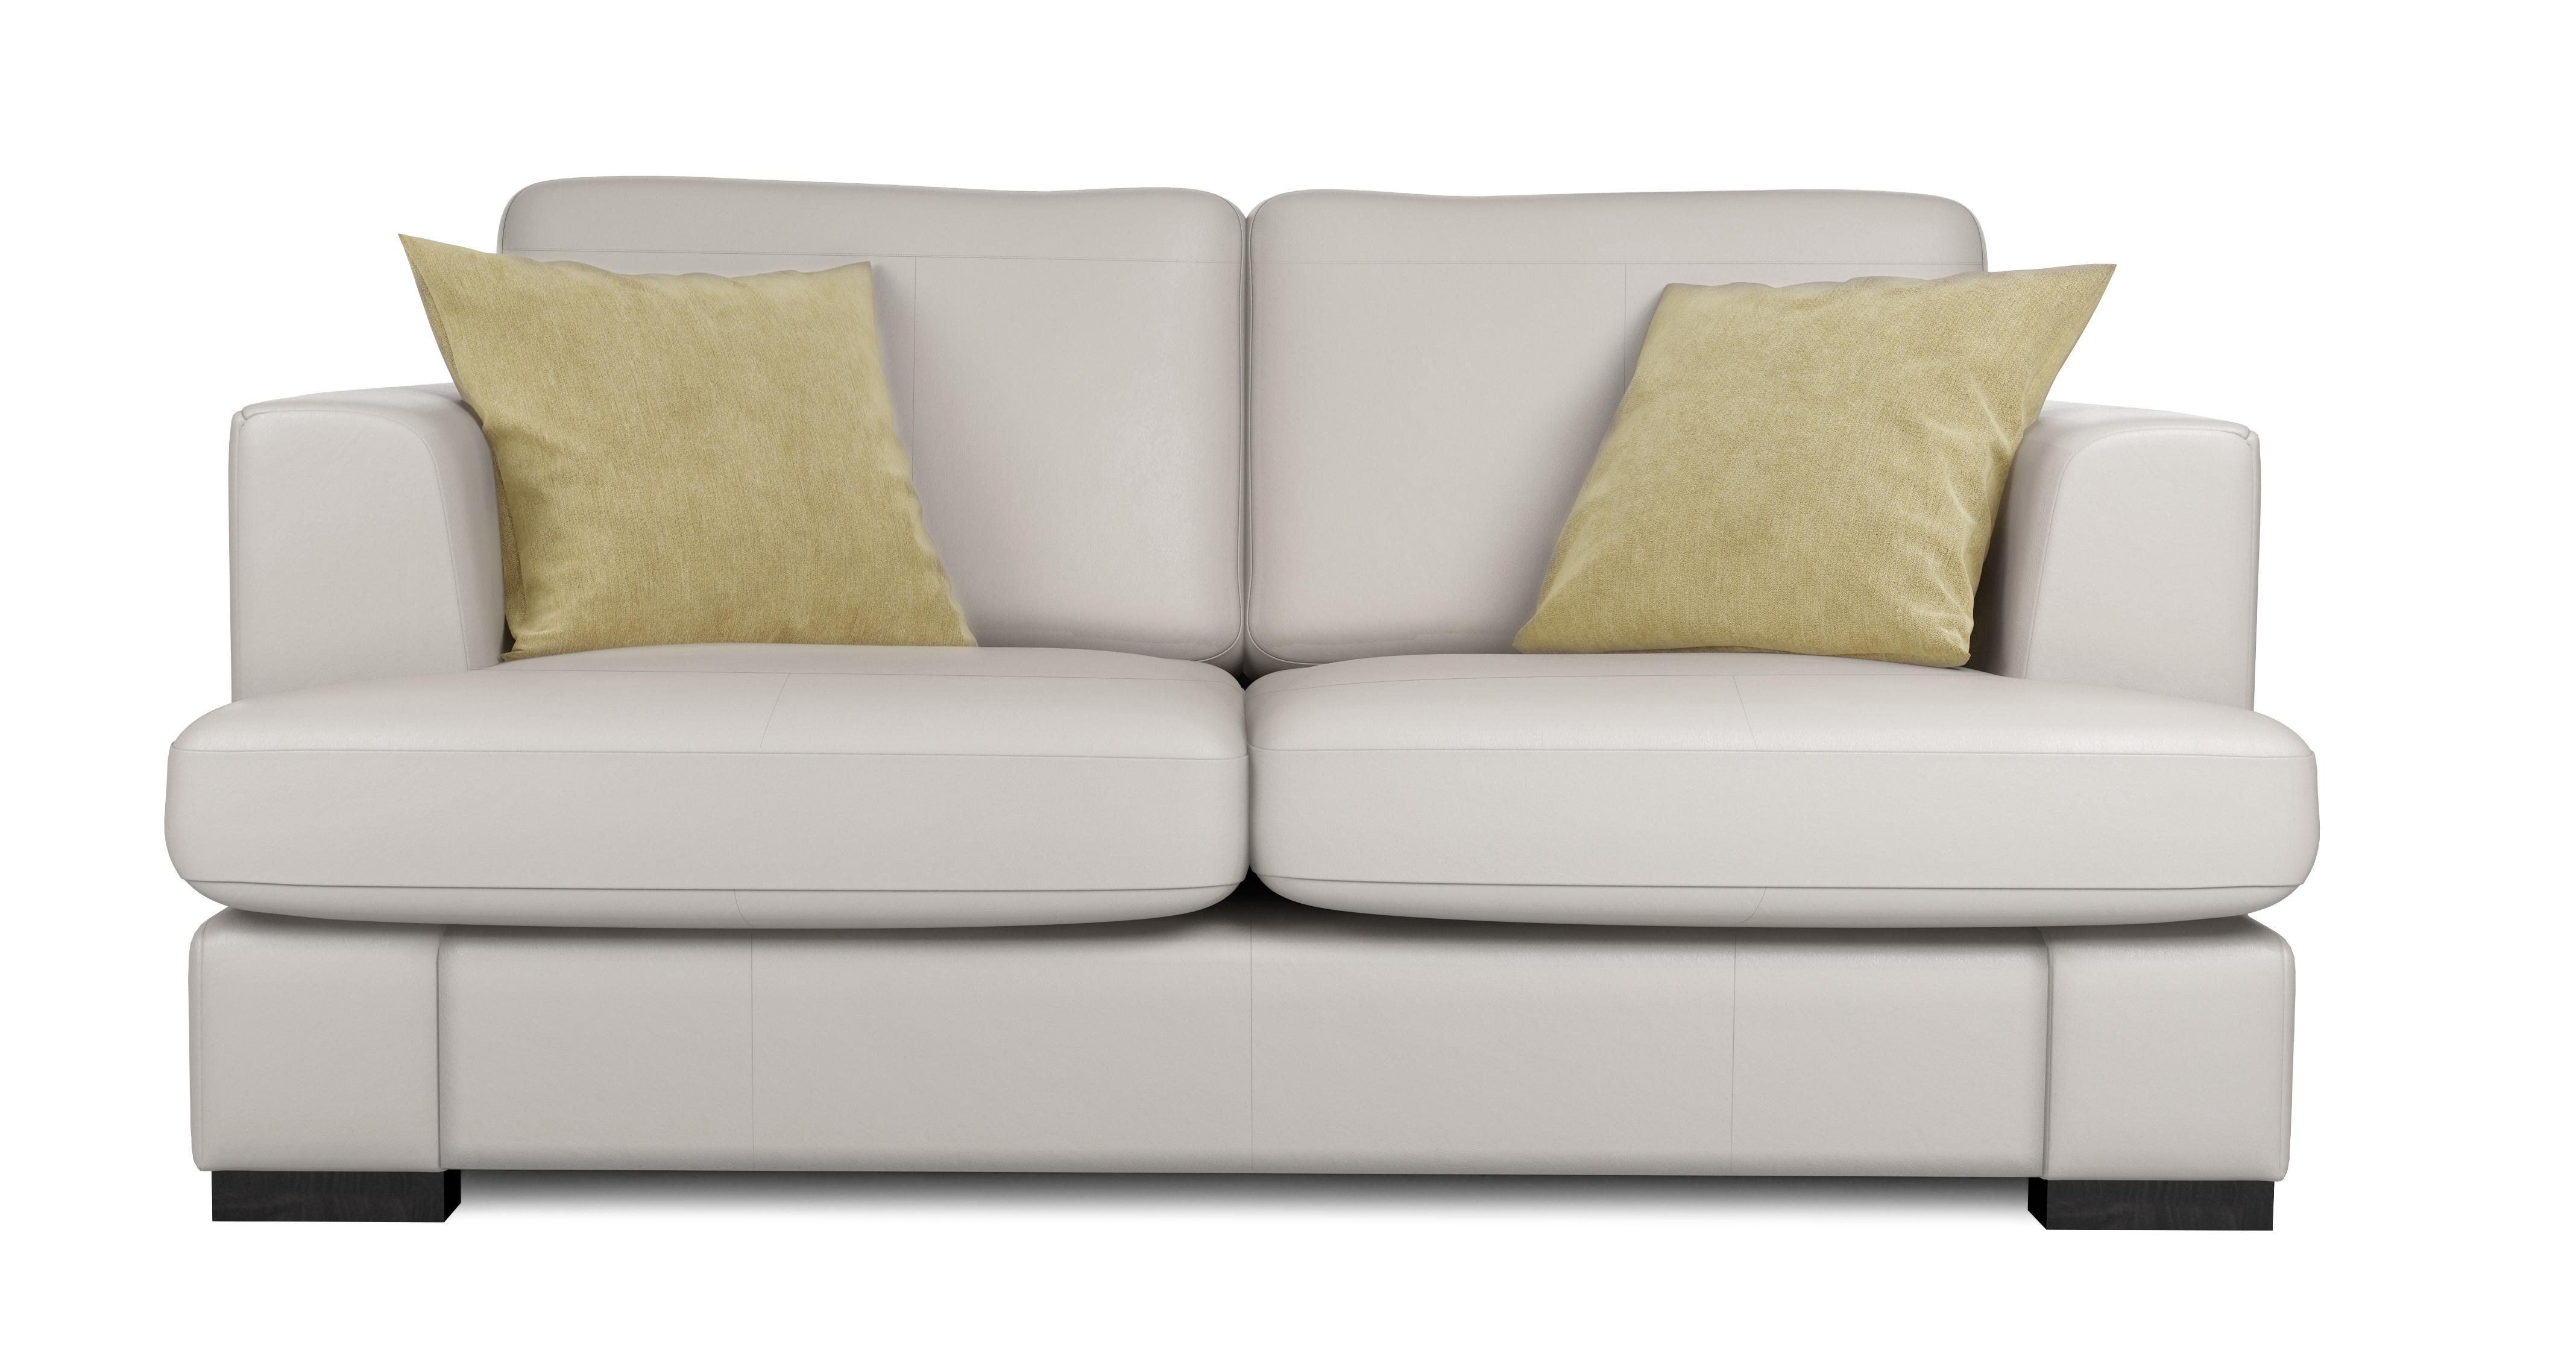 Phenomenal Freya Leather 2 Seater Sofa Machost Co Dining Chair Design Ideas Machostcouk